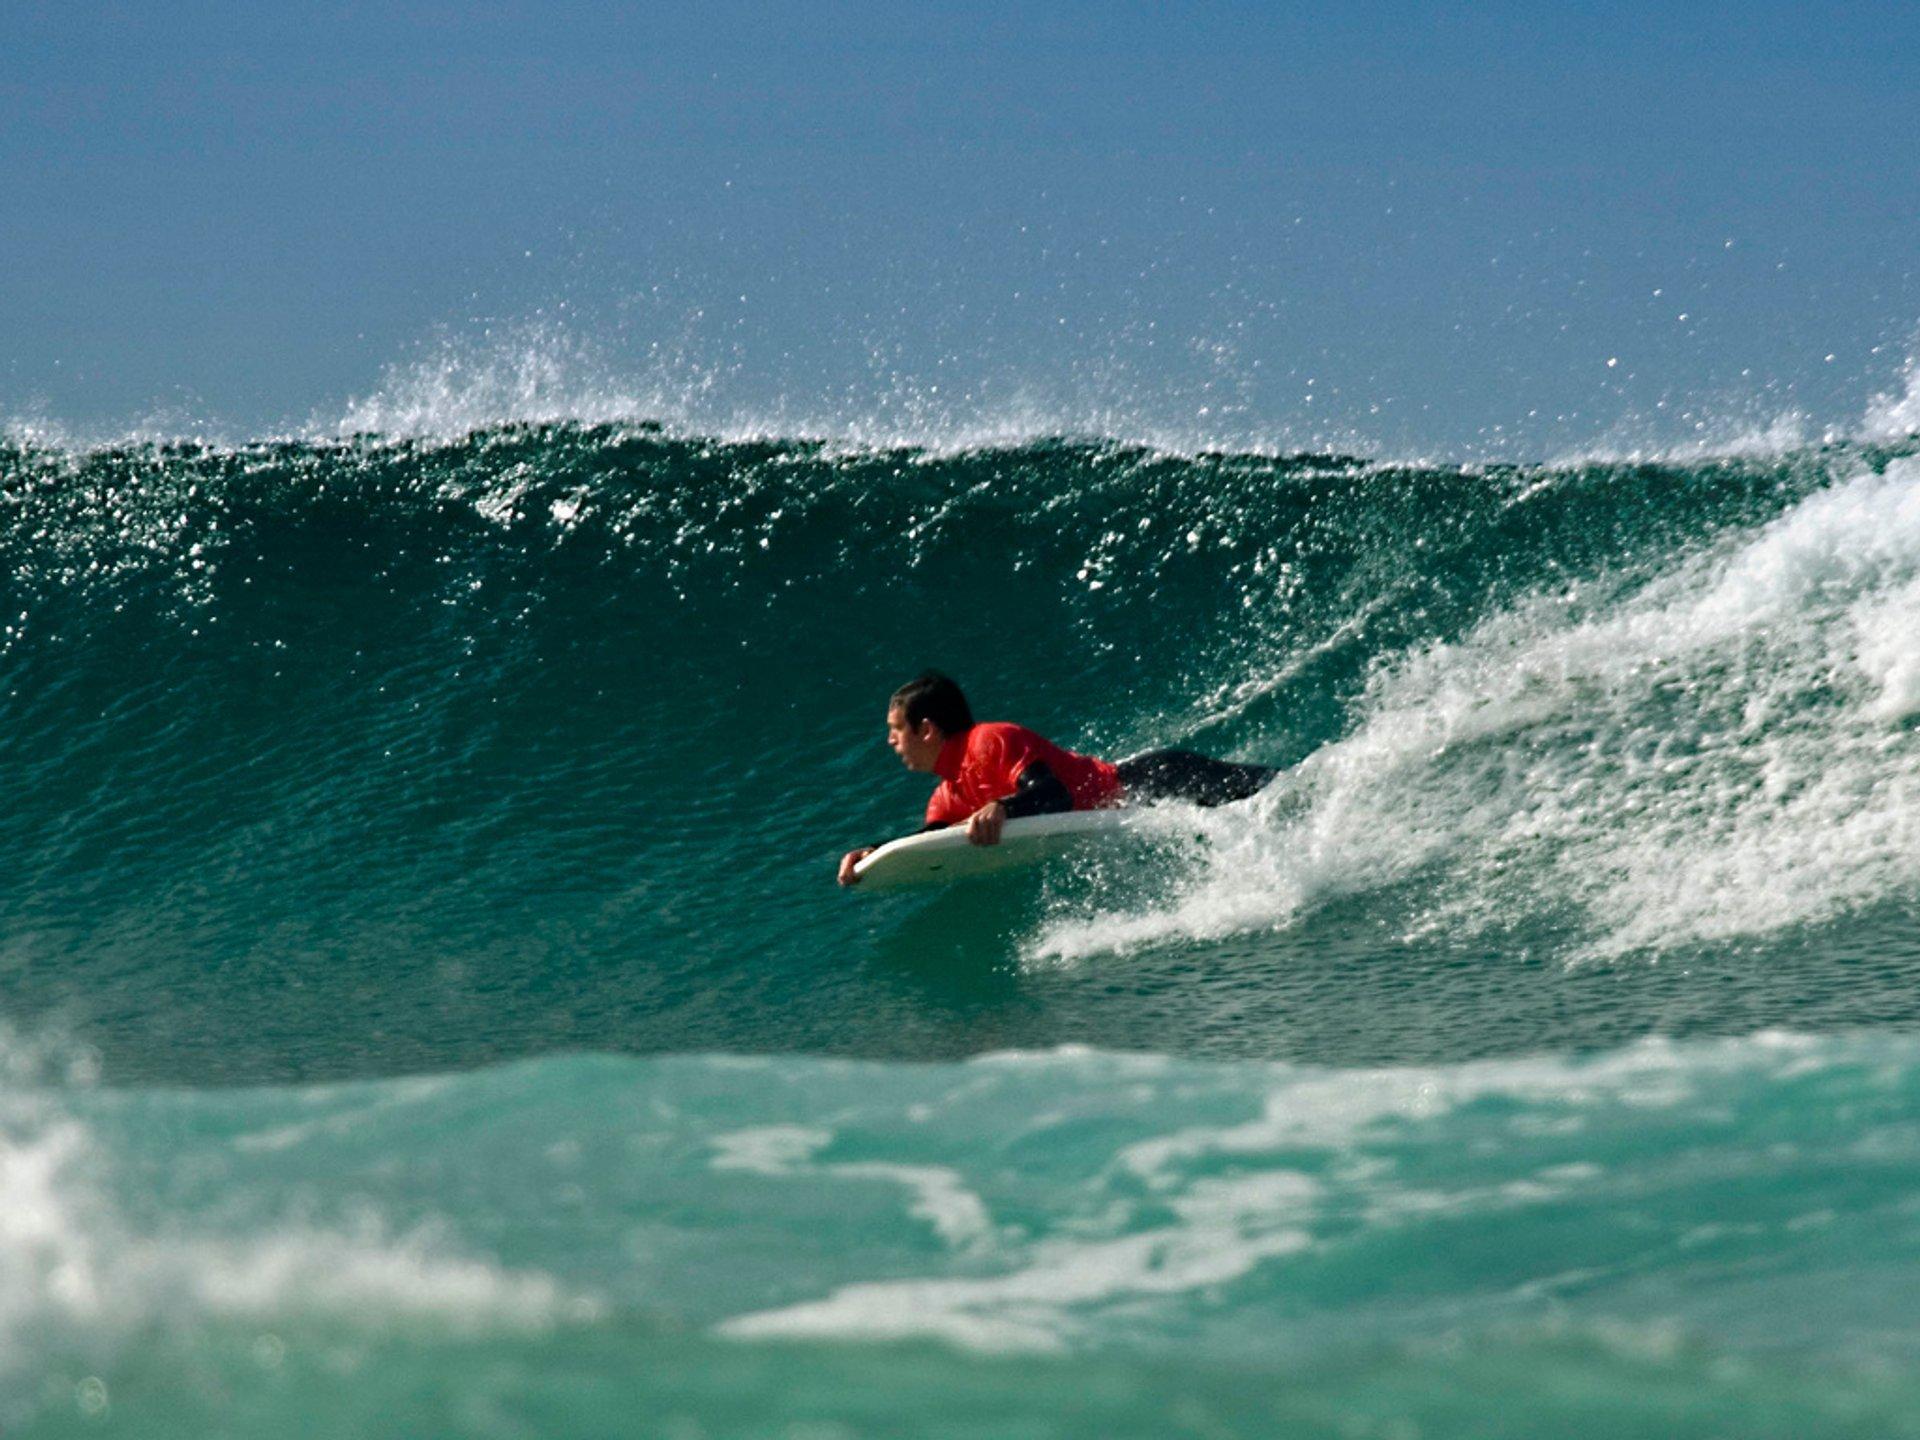 Surfing  in England - Best Season 2020